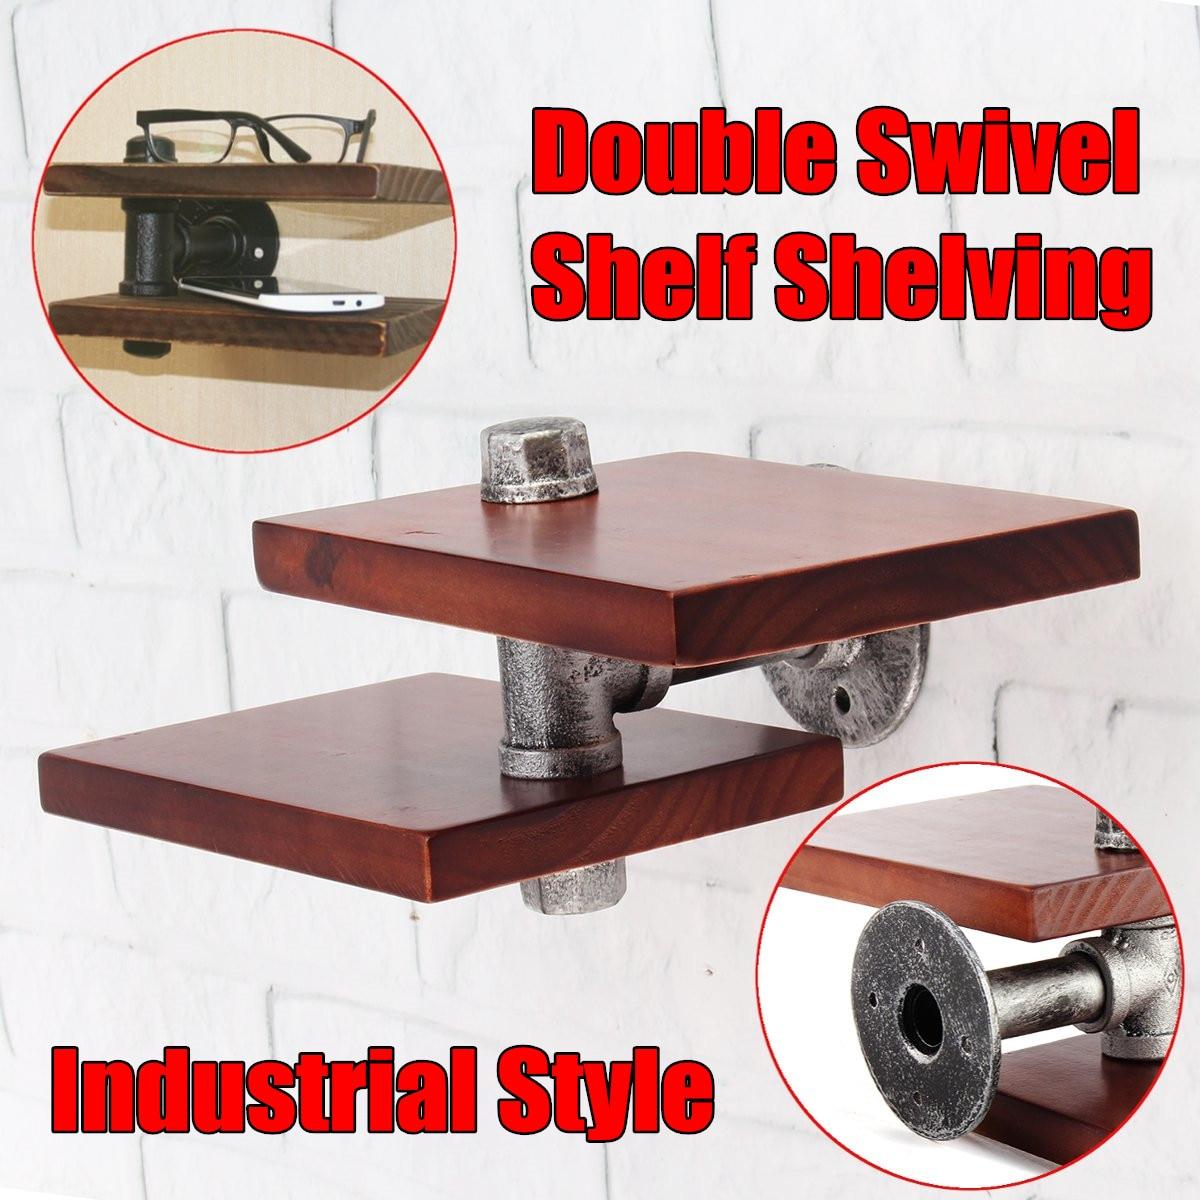 Wall Mount Wood Storage Shelf Iron Pipe Double Swivel Shelf Shelving Adjustable Kitchen Bathroom Shelves Storage Holders